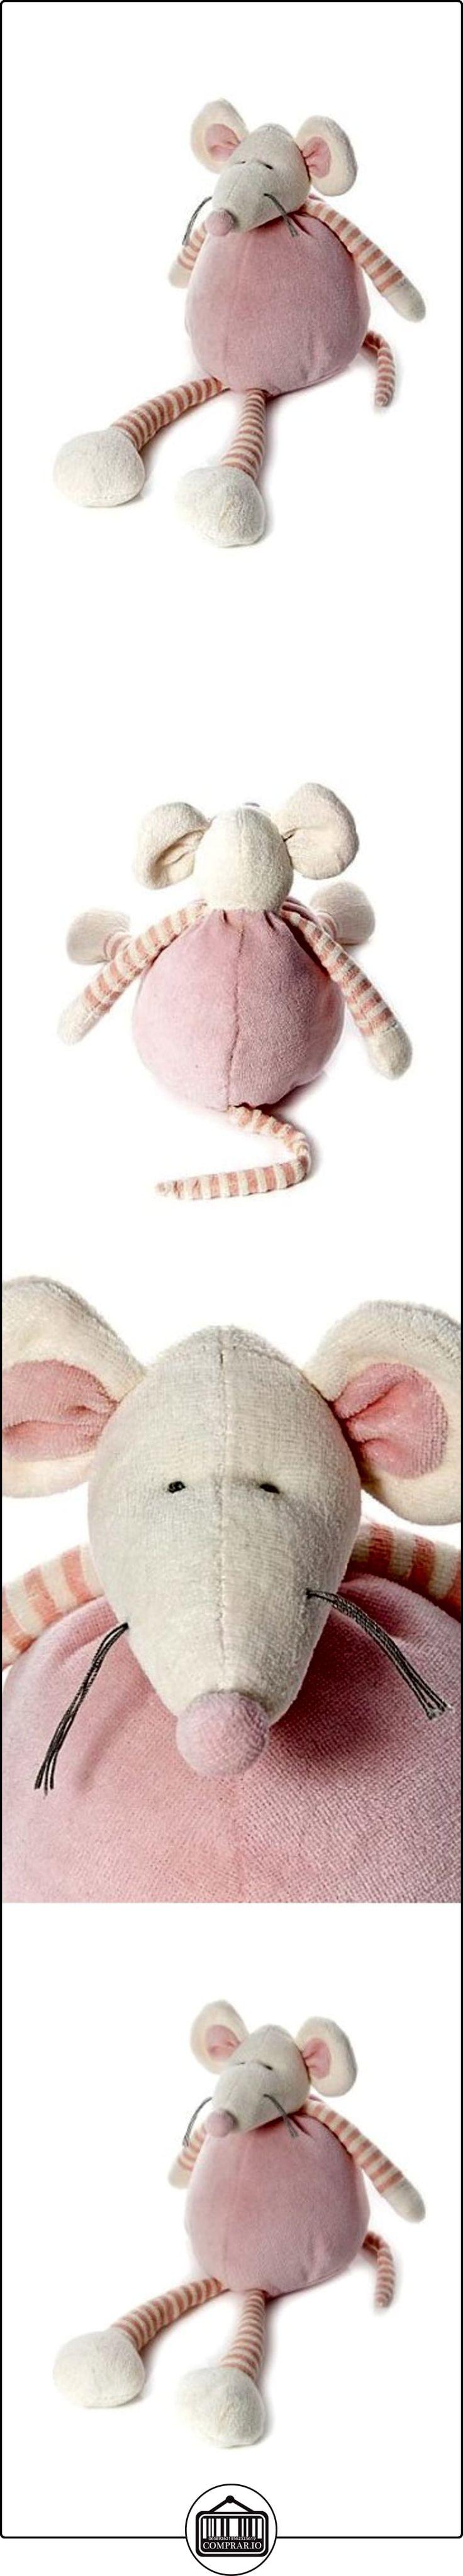 Ratita rosa de peluche de 26cm para niñas recién nacidas  ✿ Regalos para recién nacidos - Bebes ✿ ▬► Ver oferta: http://comprar.io/goto/B00D922D74